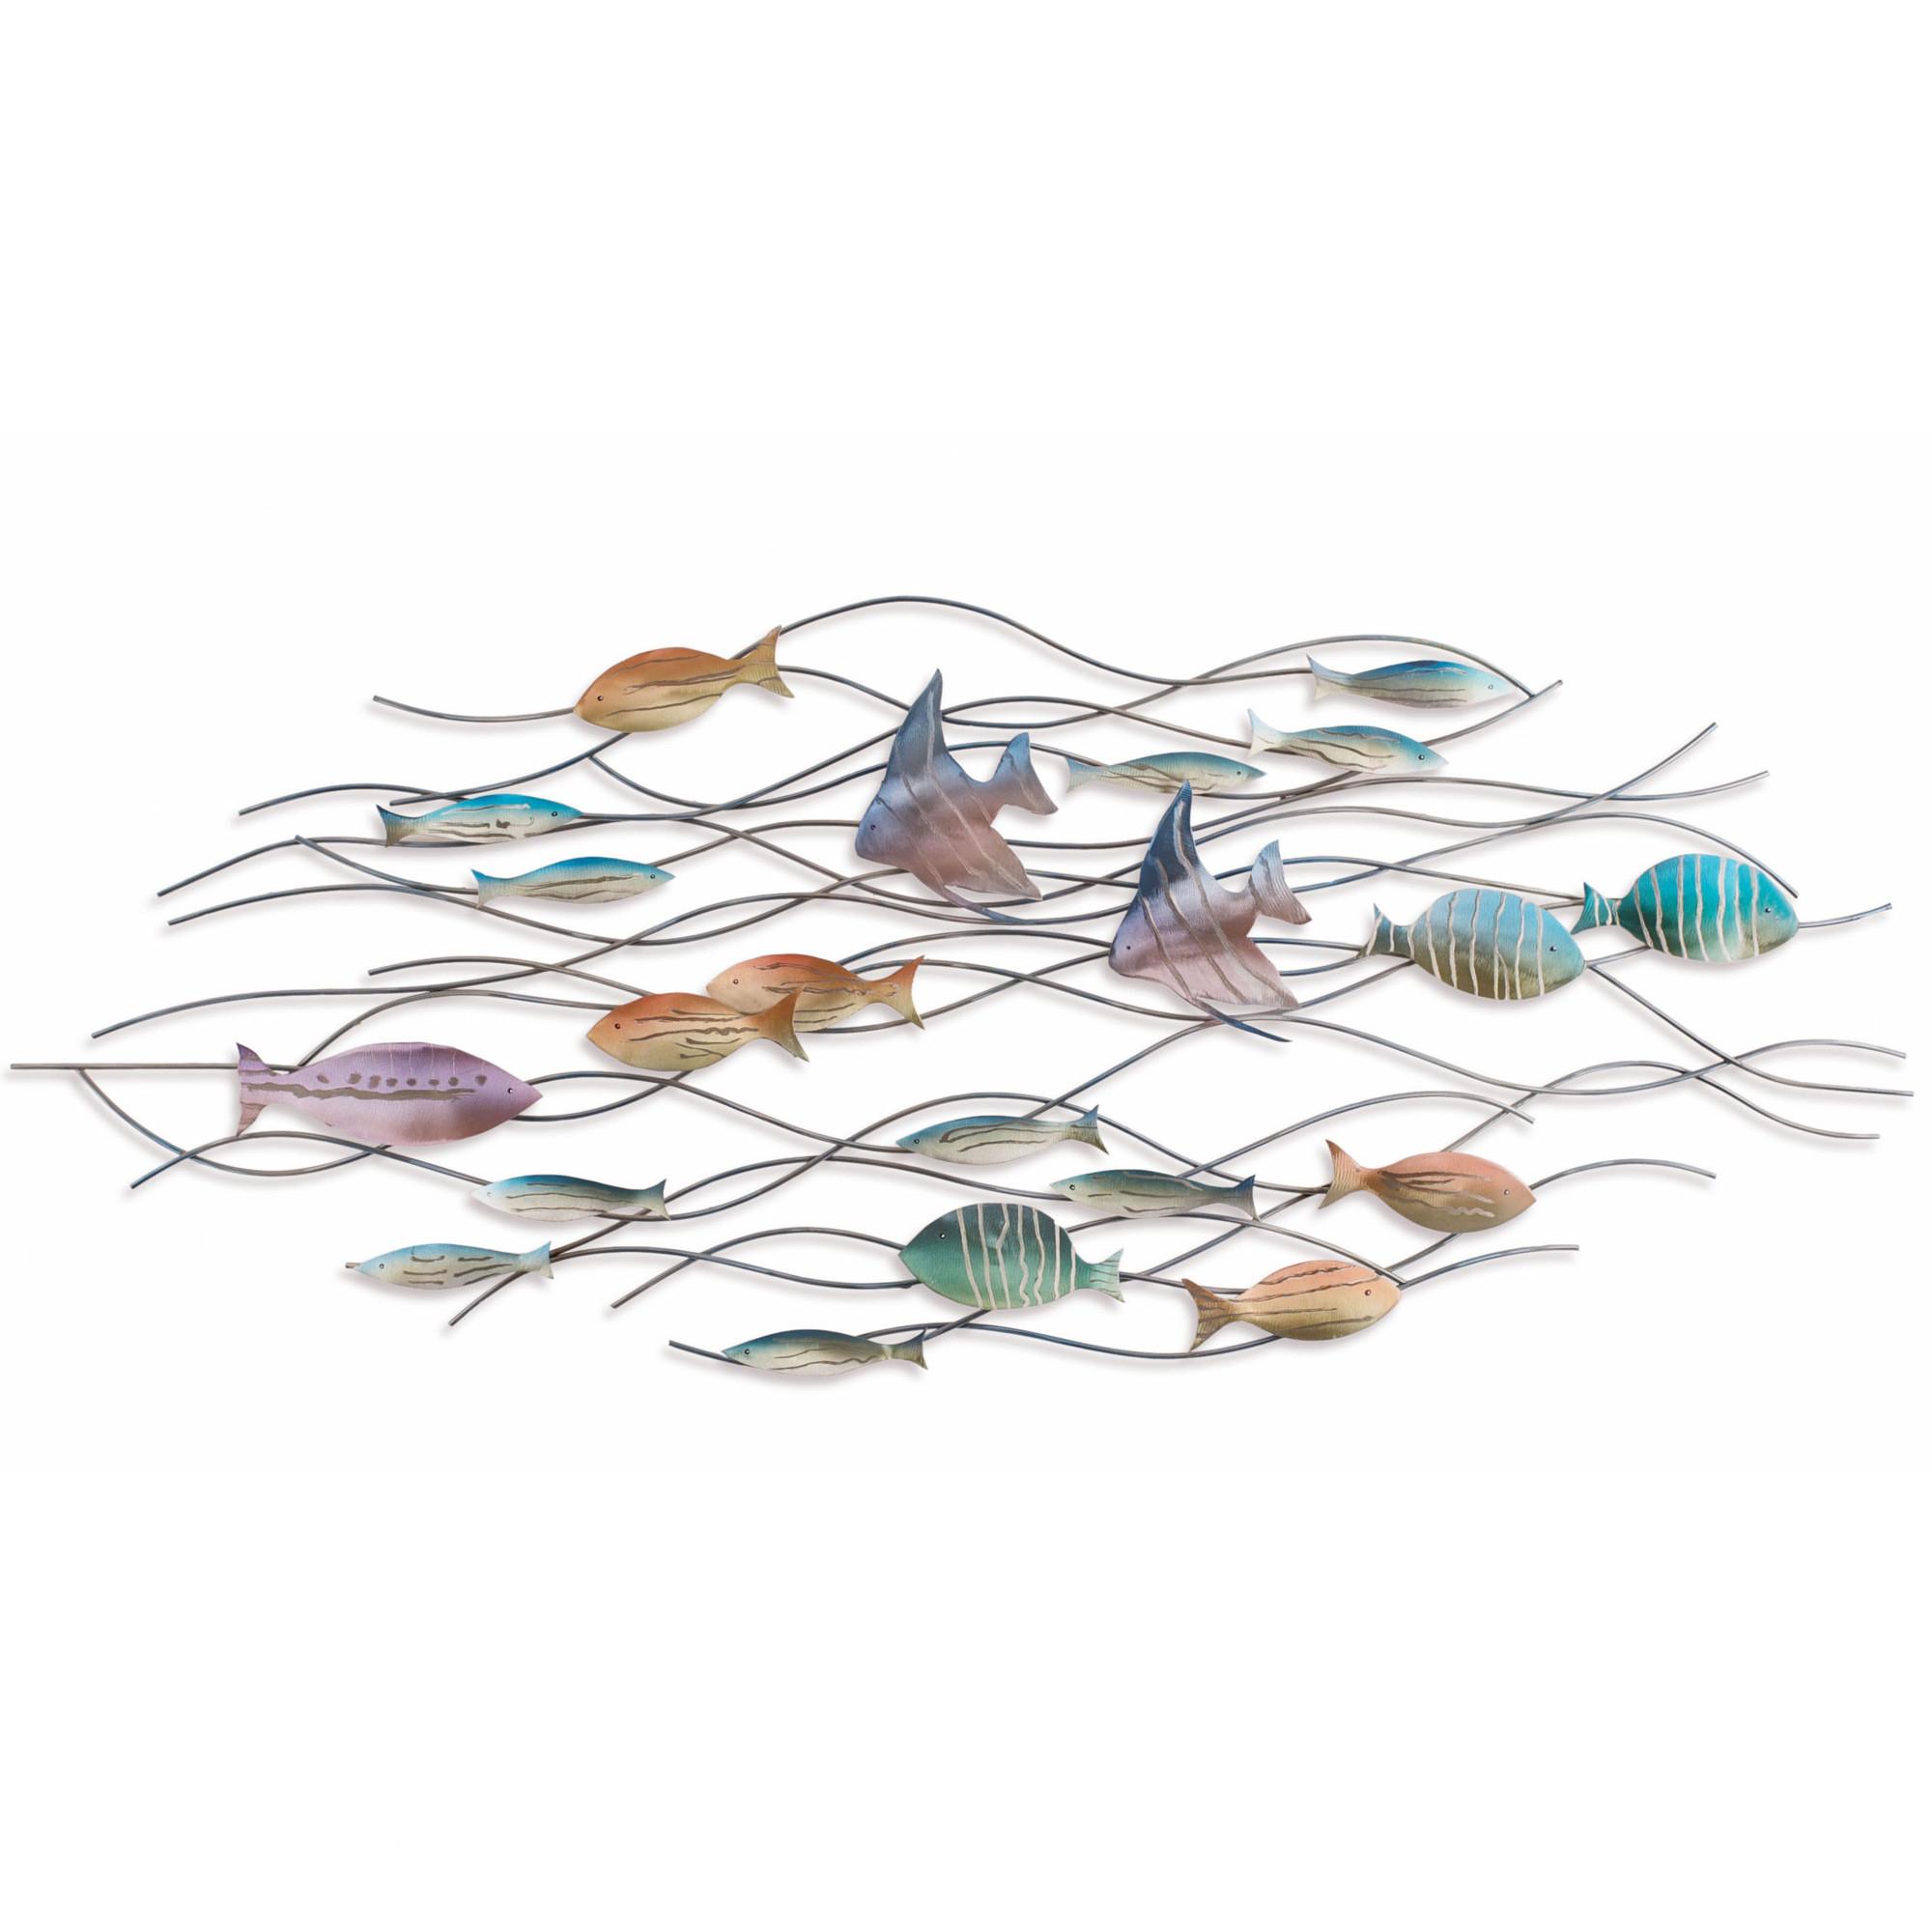 Large School Of Tropical Fish – Nautical Metal Wall Art In Favorite Coastal Metal Fish Wall Decor (Gallery 5 of 20)